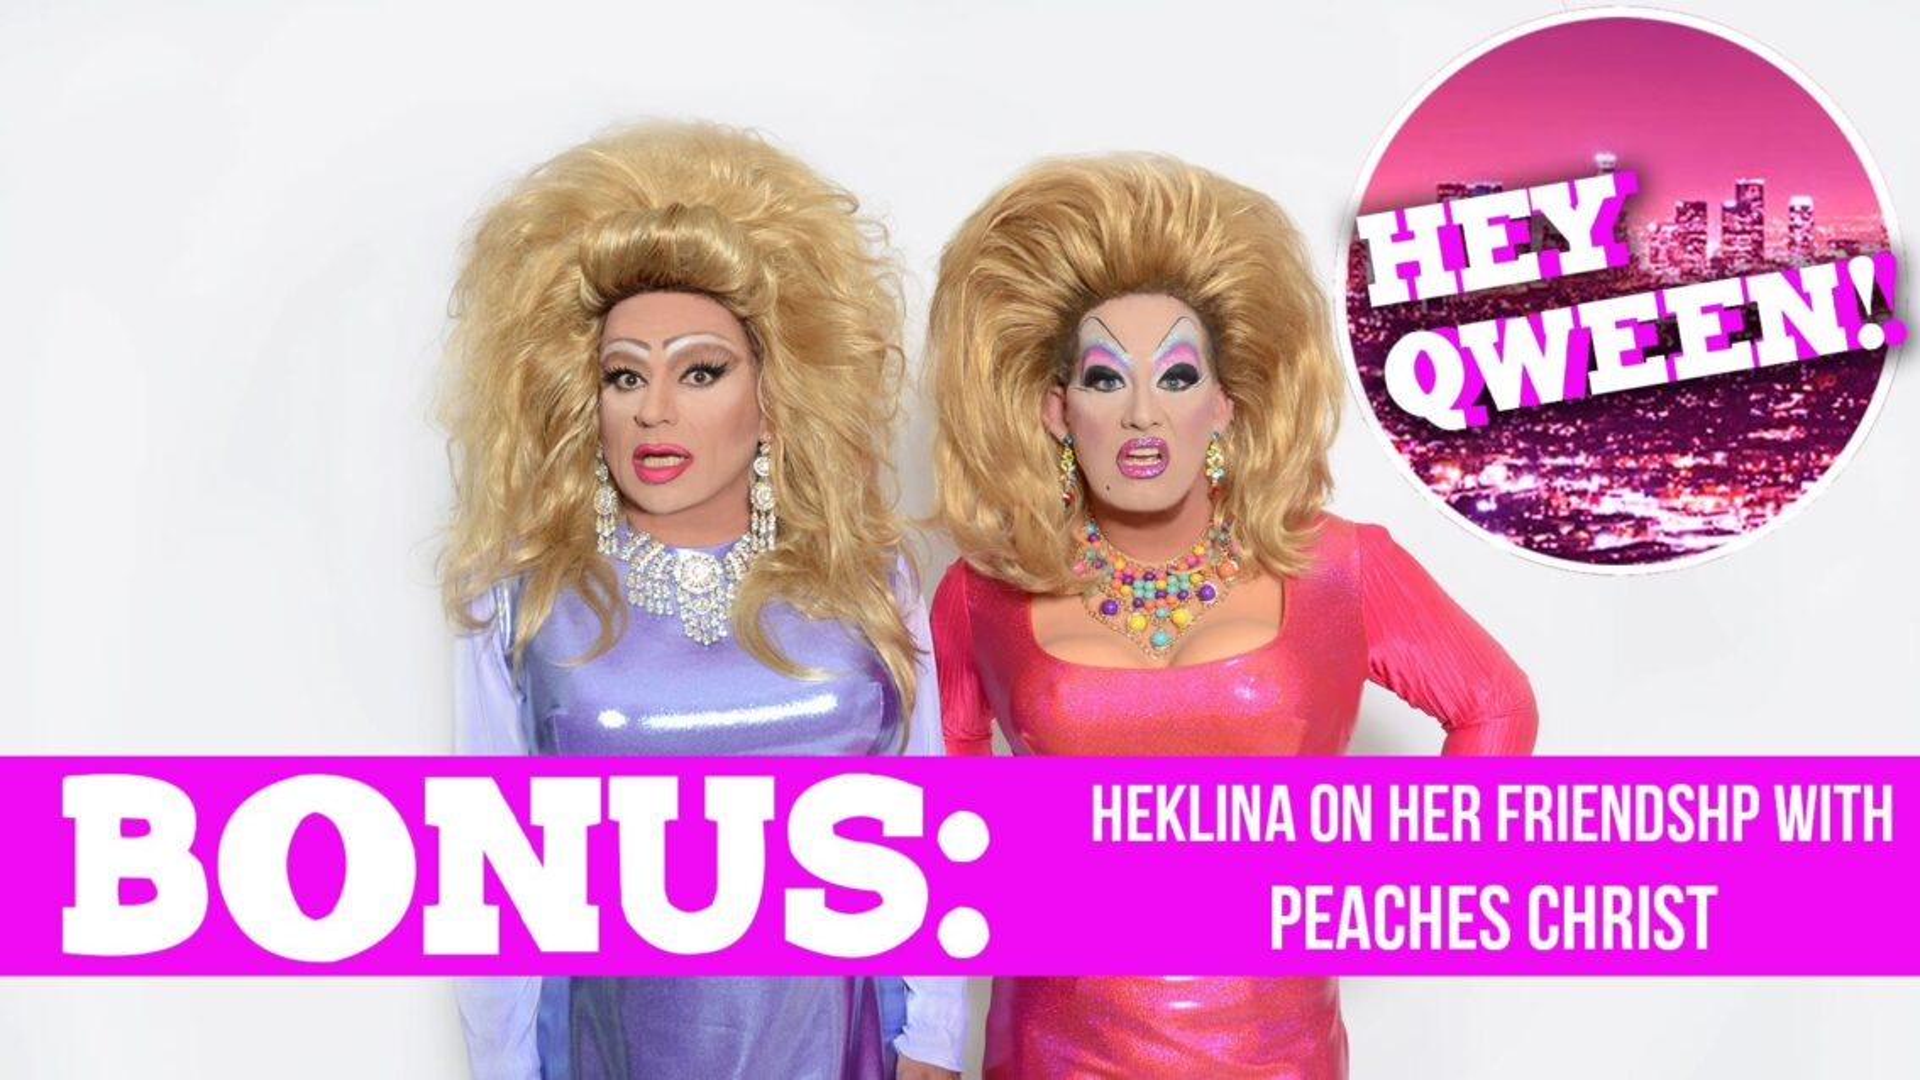 Hey Qween! BONUS: Heklina On Her Friendship With Peaches Christ